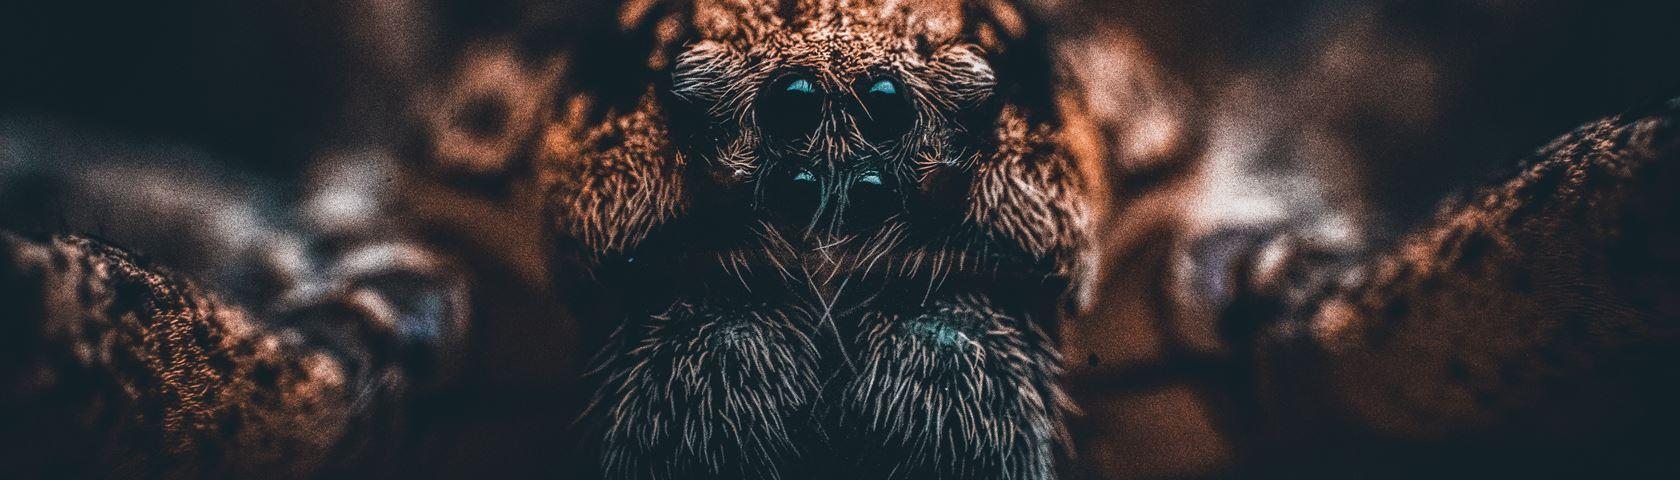 Spider Close-Up